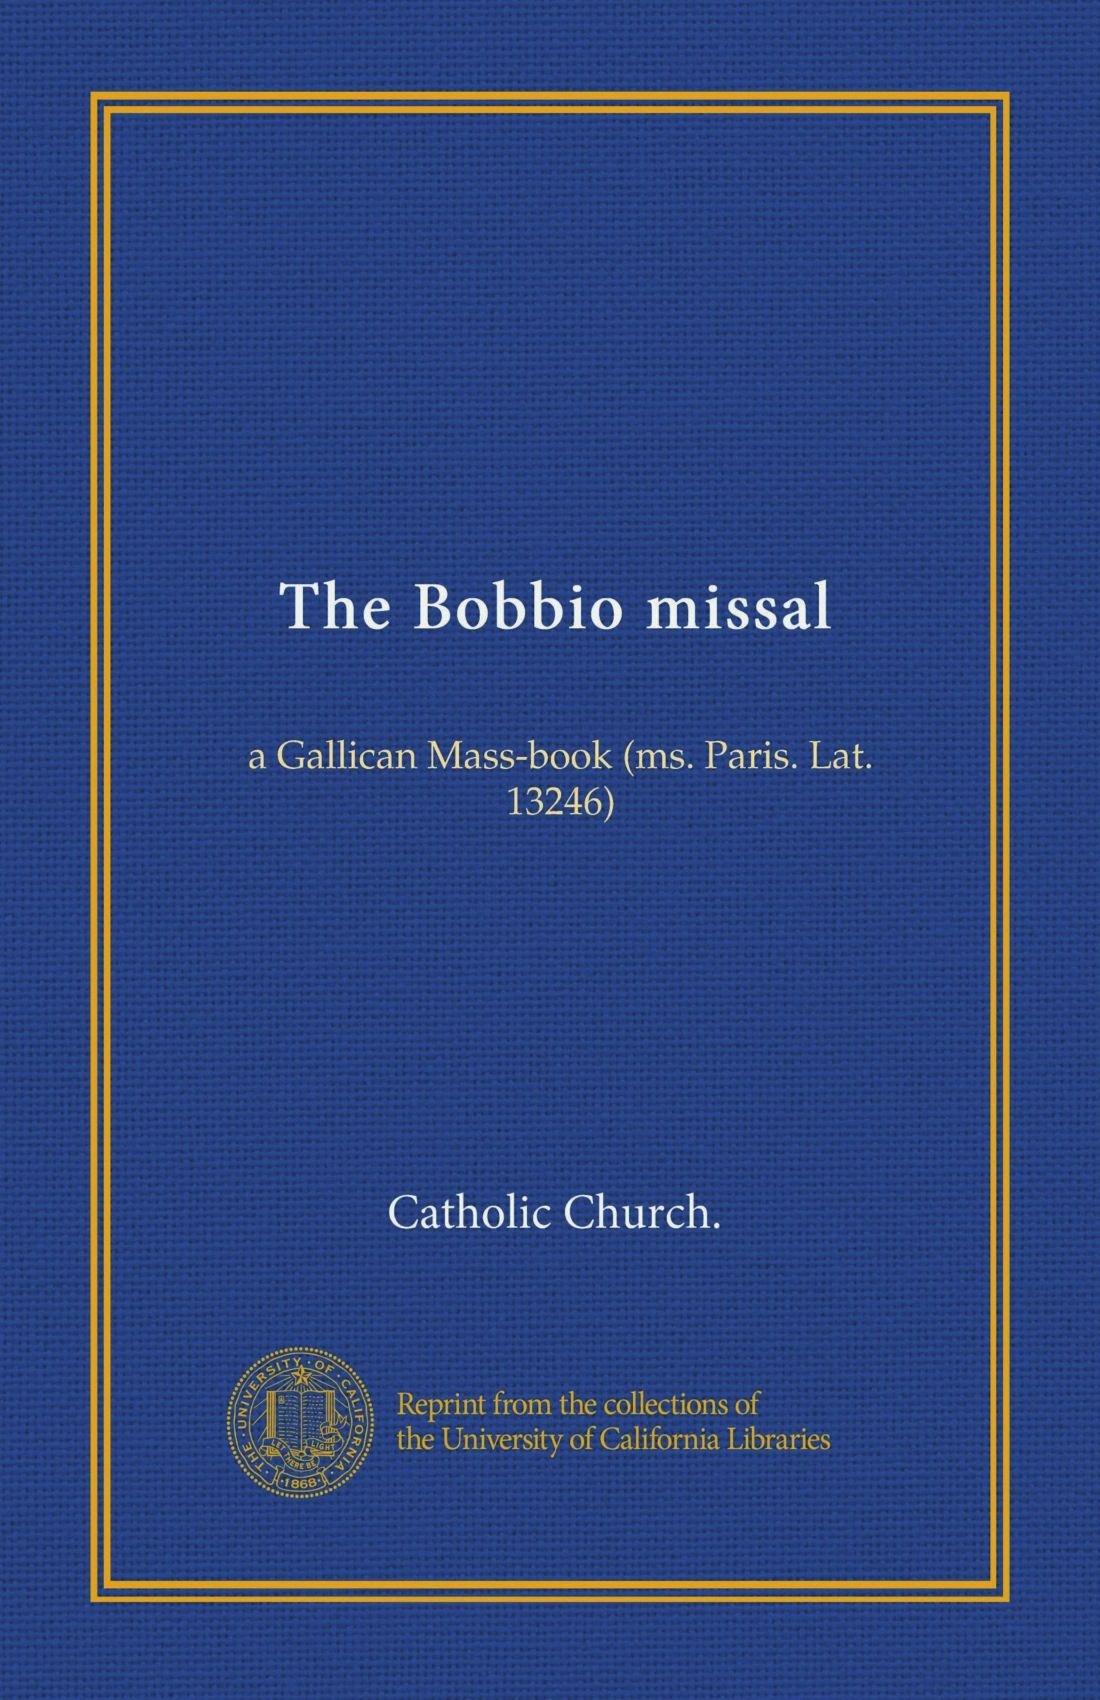 The Bobbio missal: a Gallican Mass-book (ms  Paris  Lat